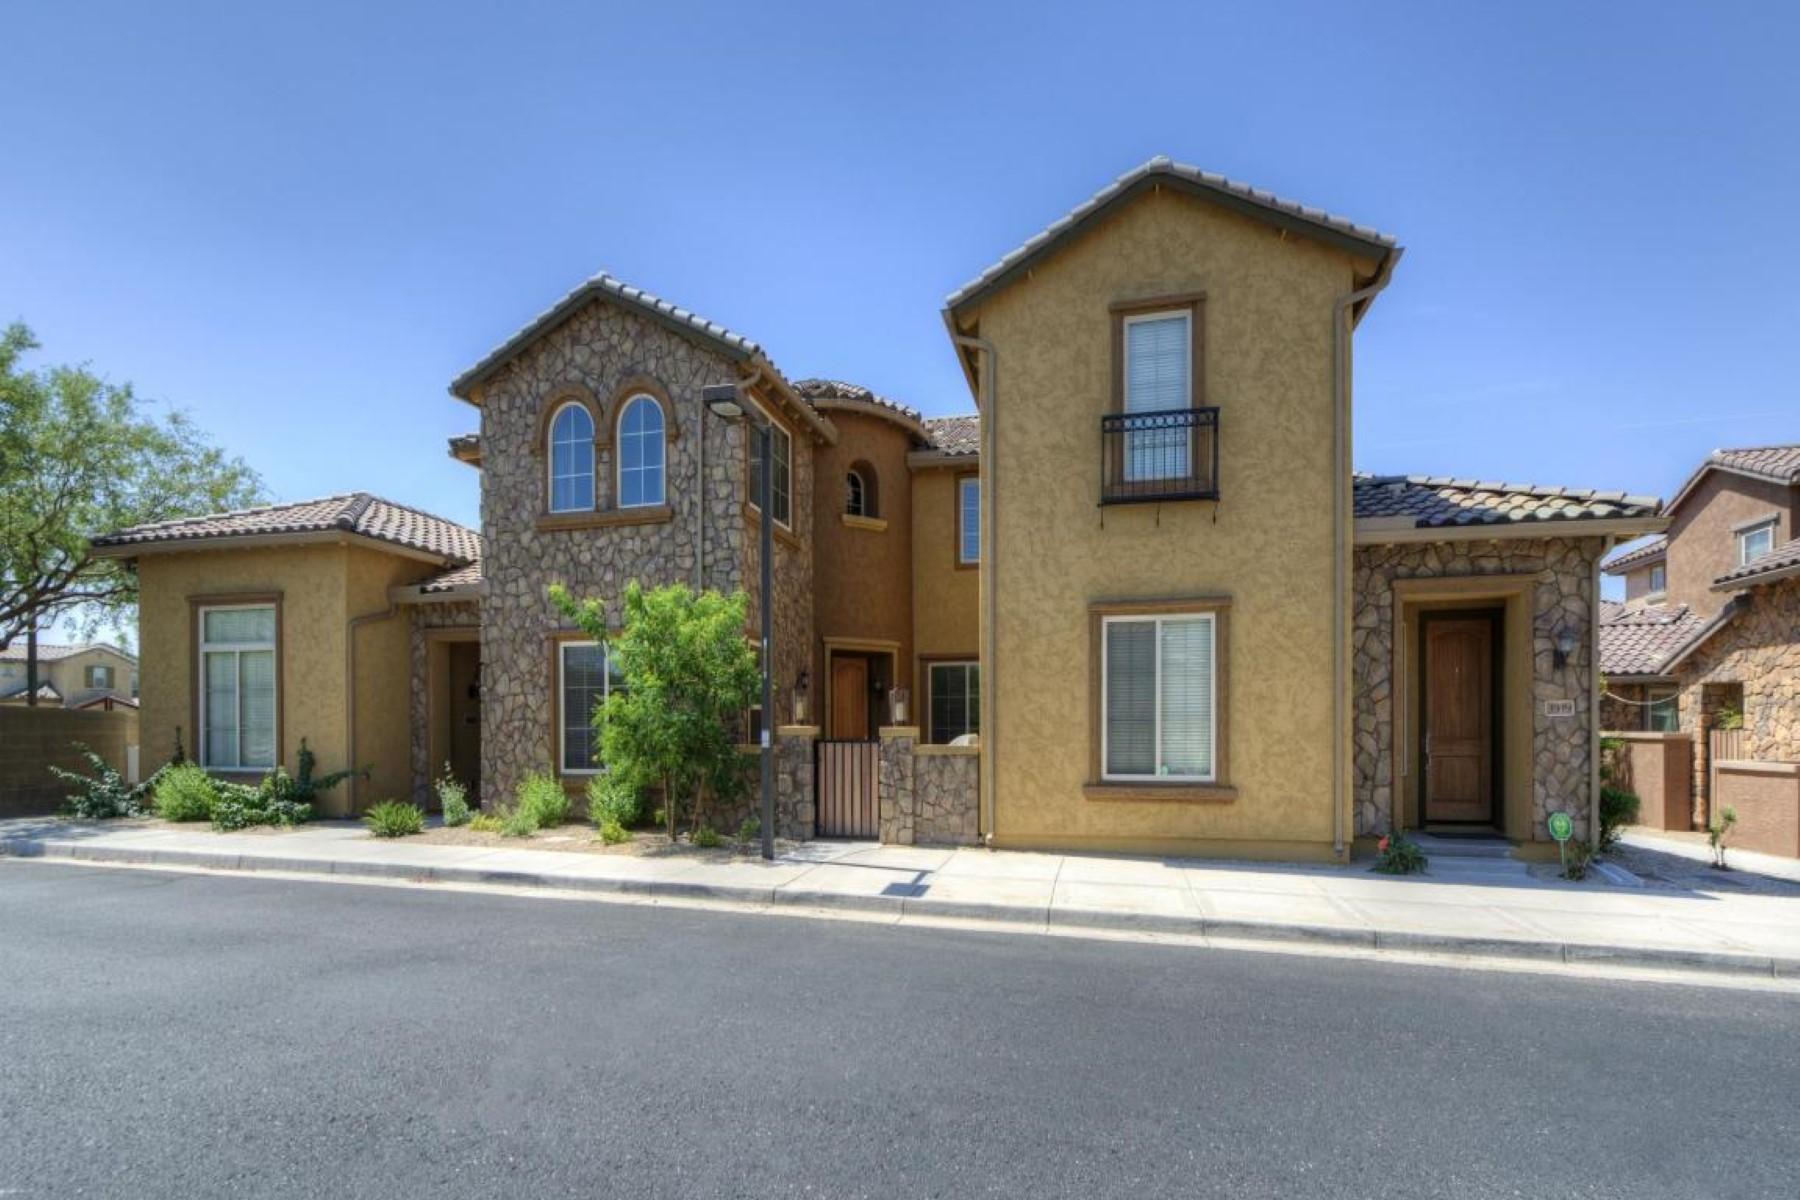 Villa per Vendita alle ore Luxury, low maintenance townhome in a gated community. 3923 E CAT BALUE DR Phoenix, Arizona 85050 Stati Uniti